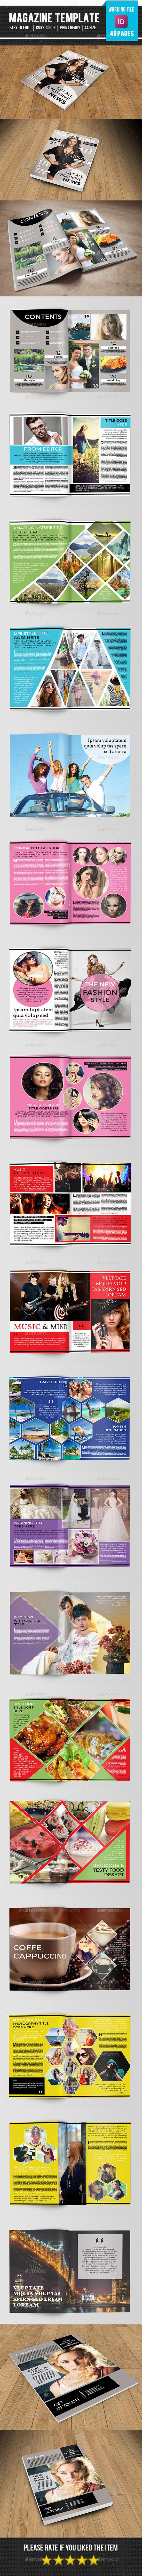 Multipurpose Magazine Template-V14 - Magazines Print Templates